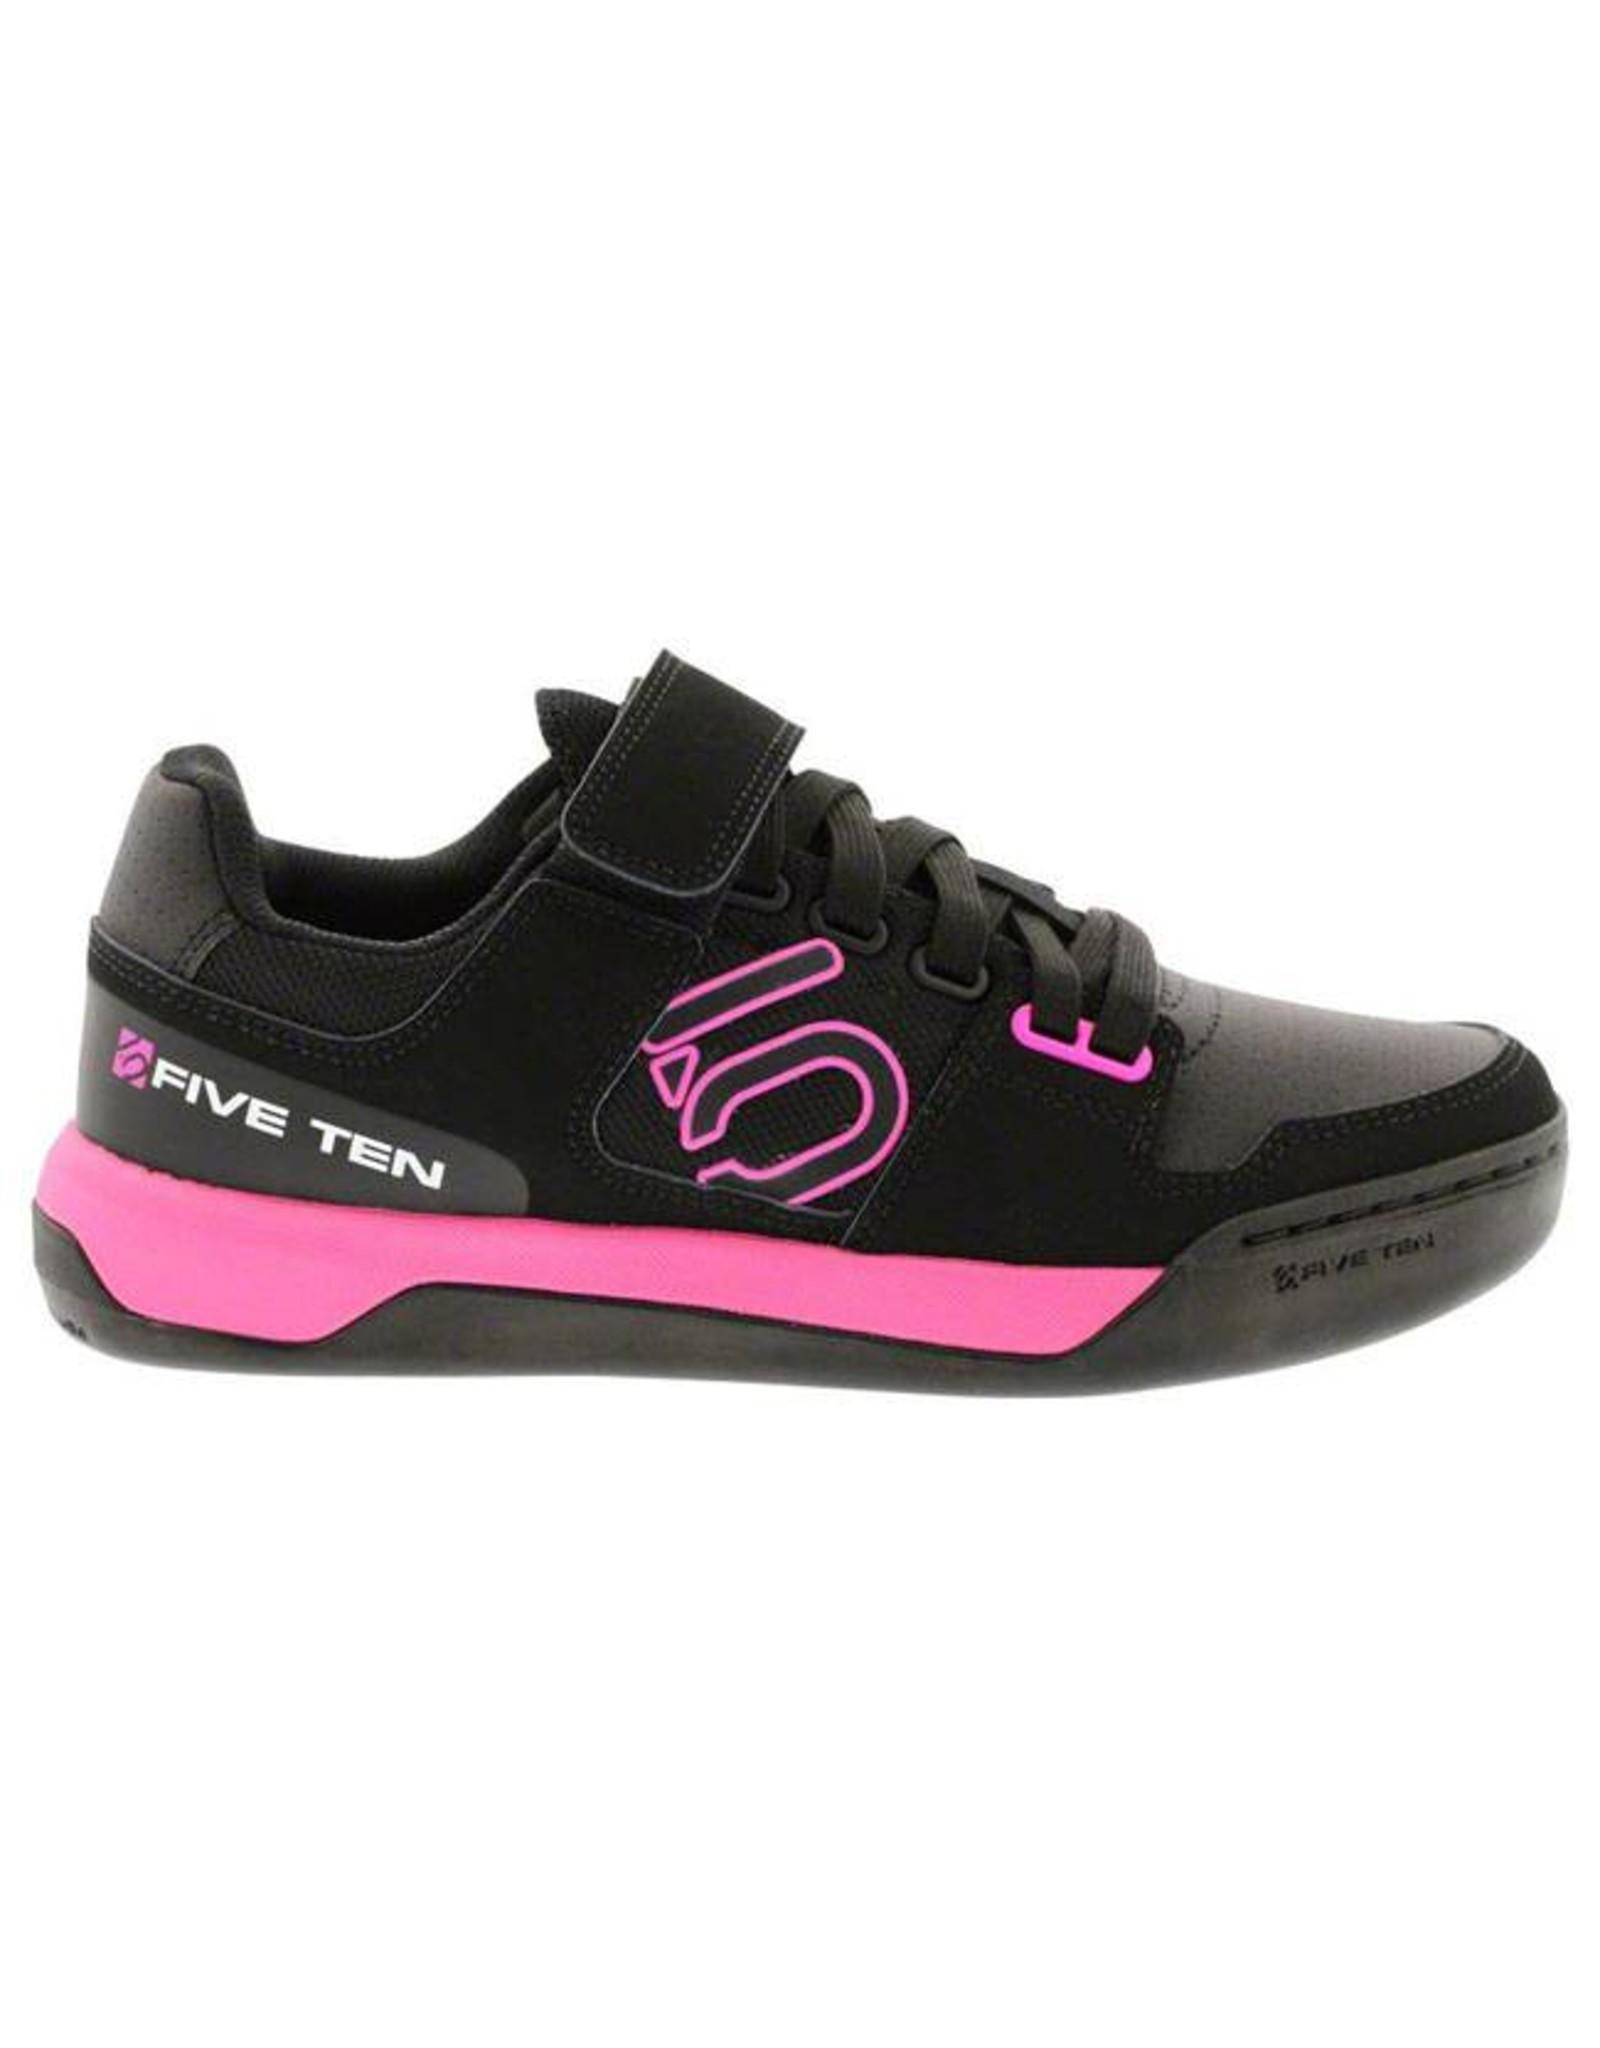 Five Ten Five Ten Hellcat Women's Clipless/Flat Pedal Shoe: Shock Pink 8.5